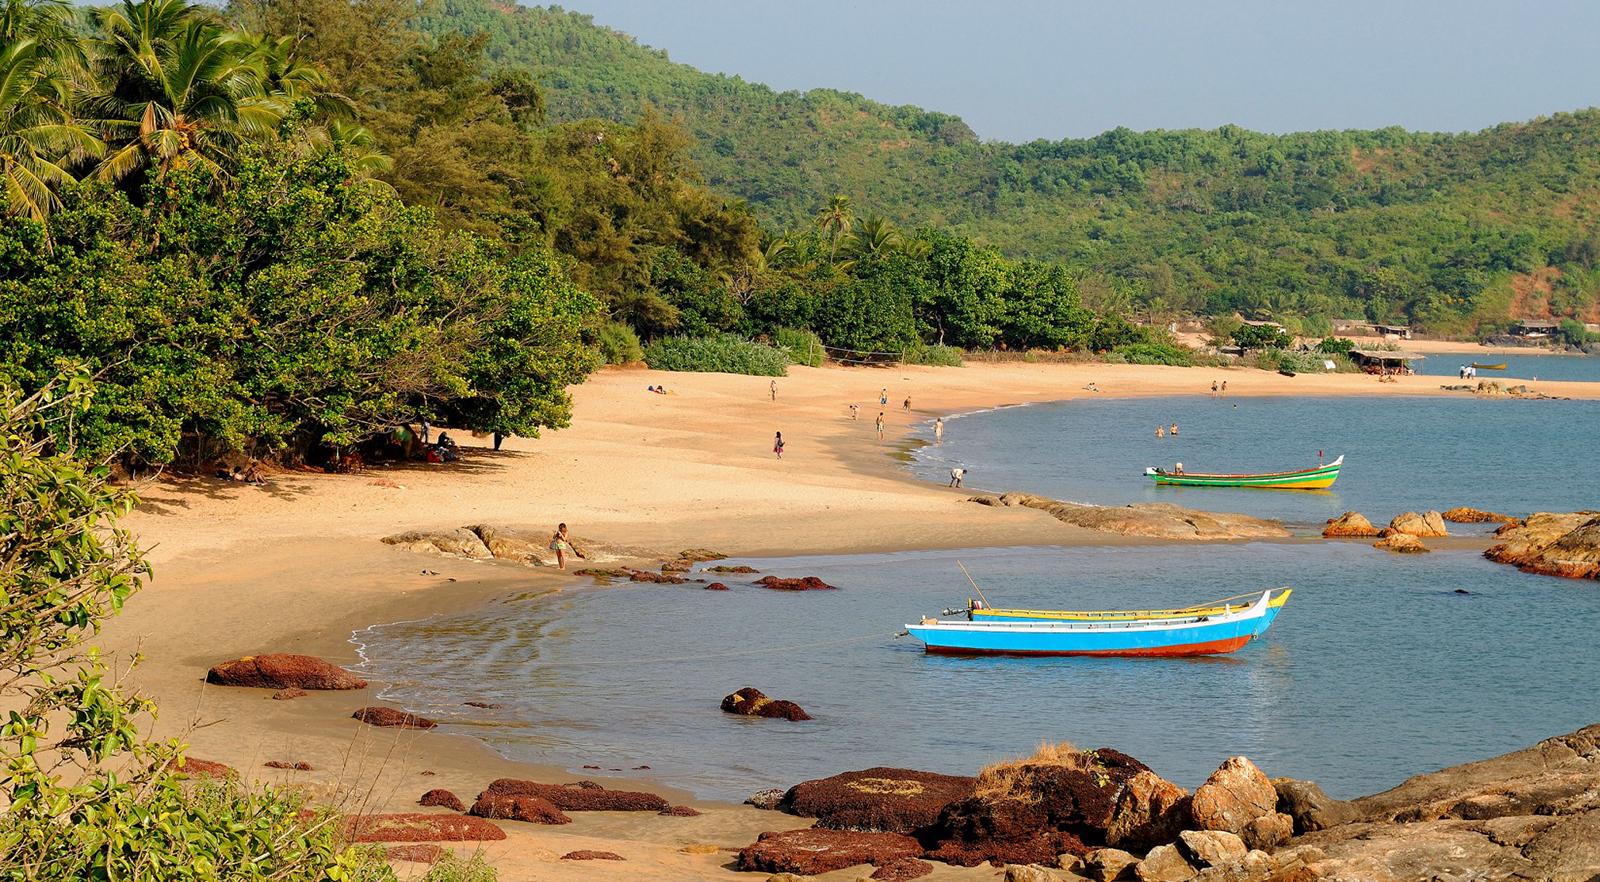 Gokanrna Beach